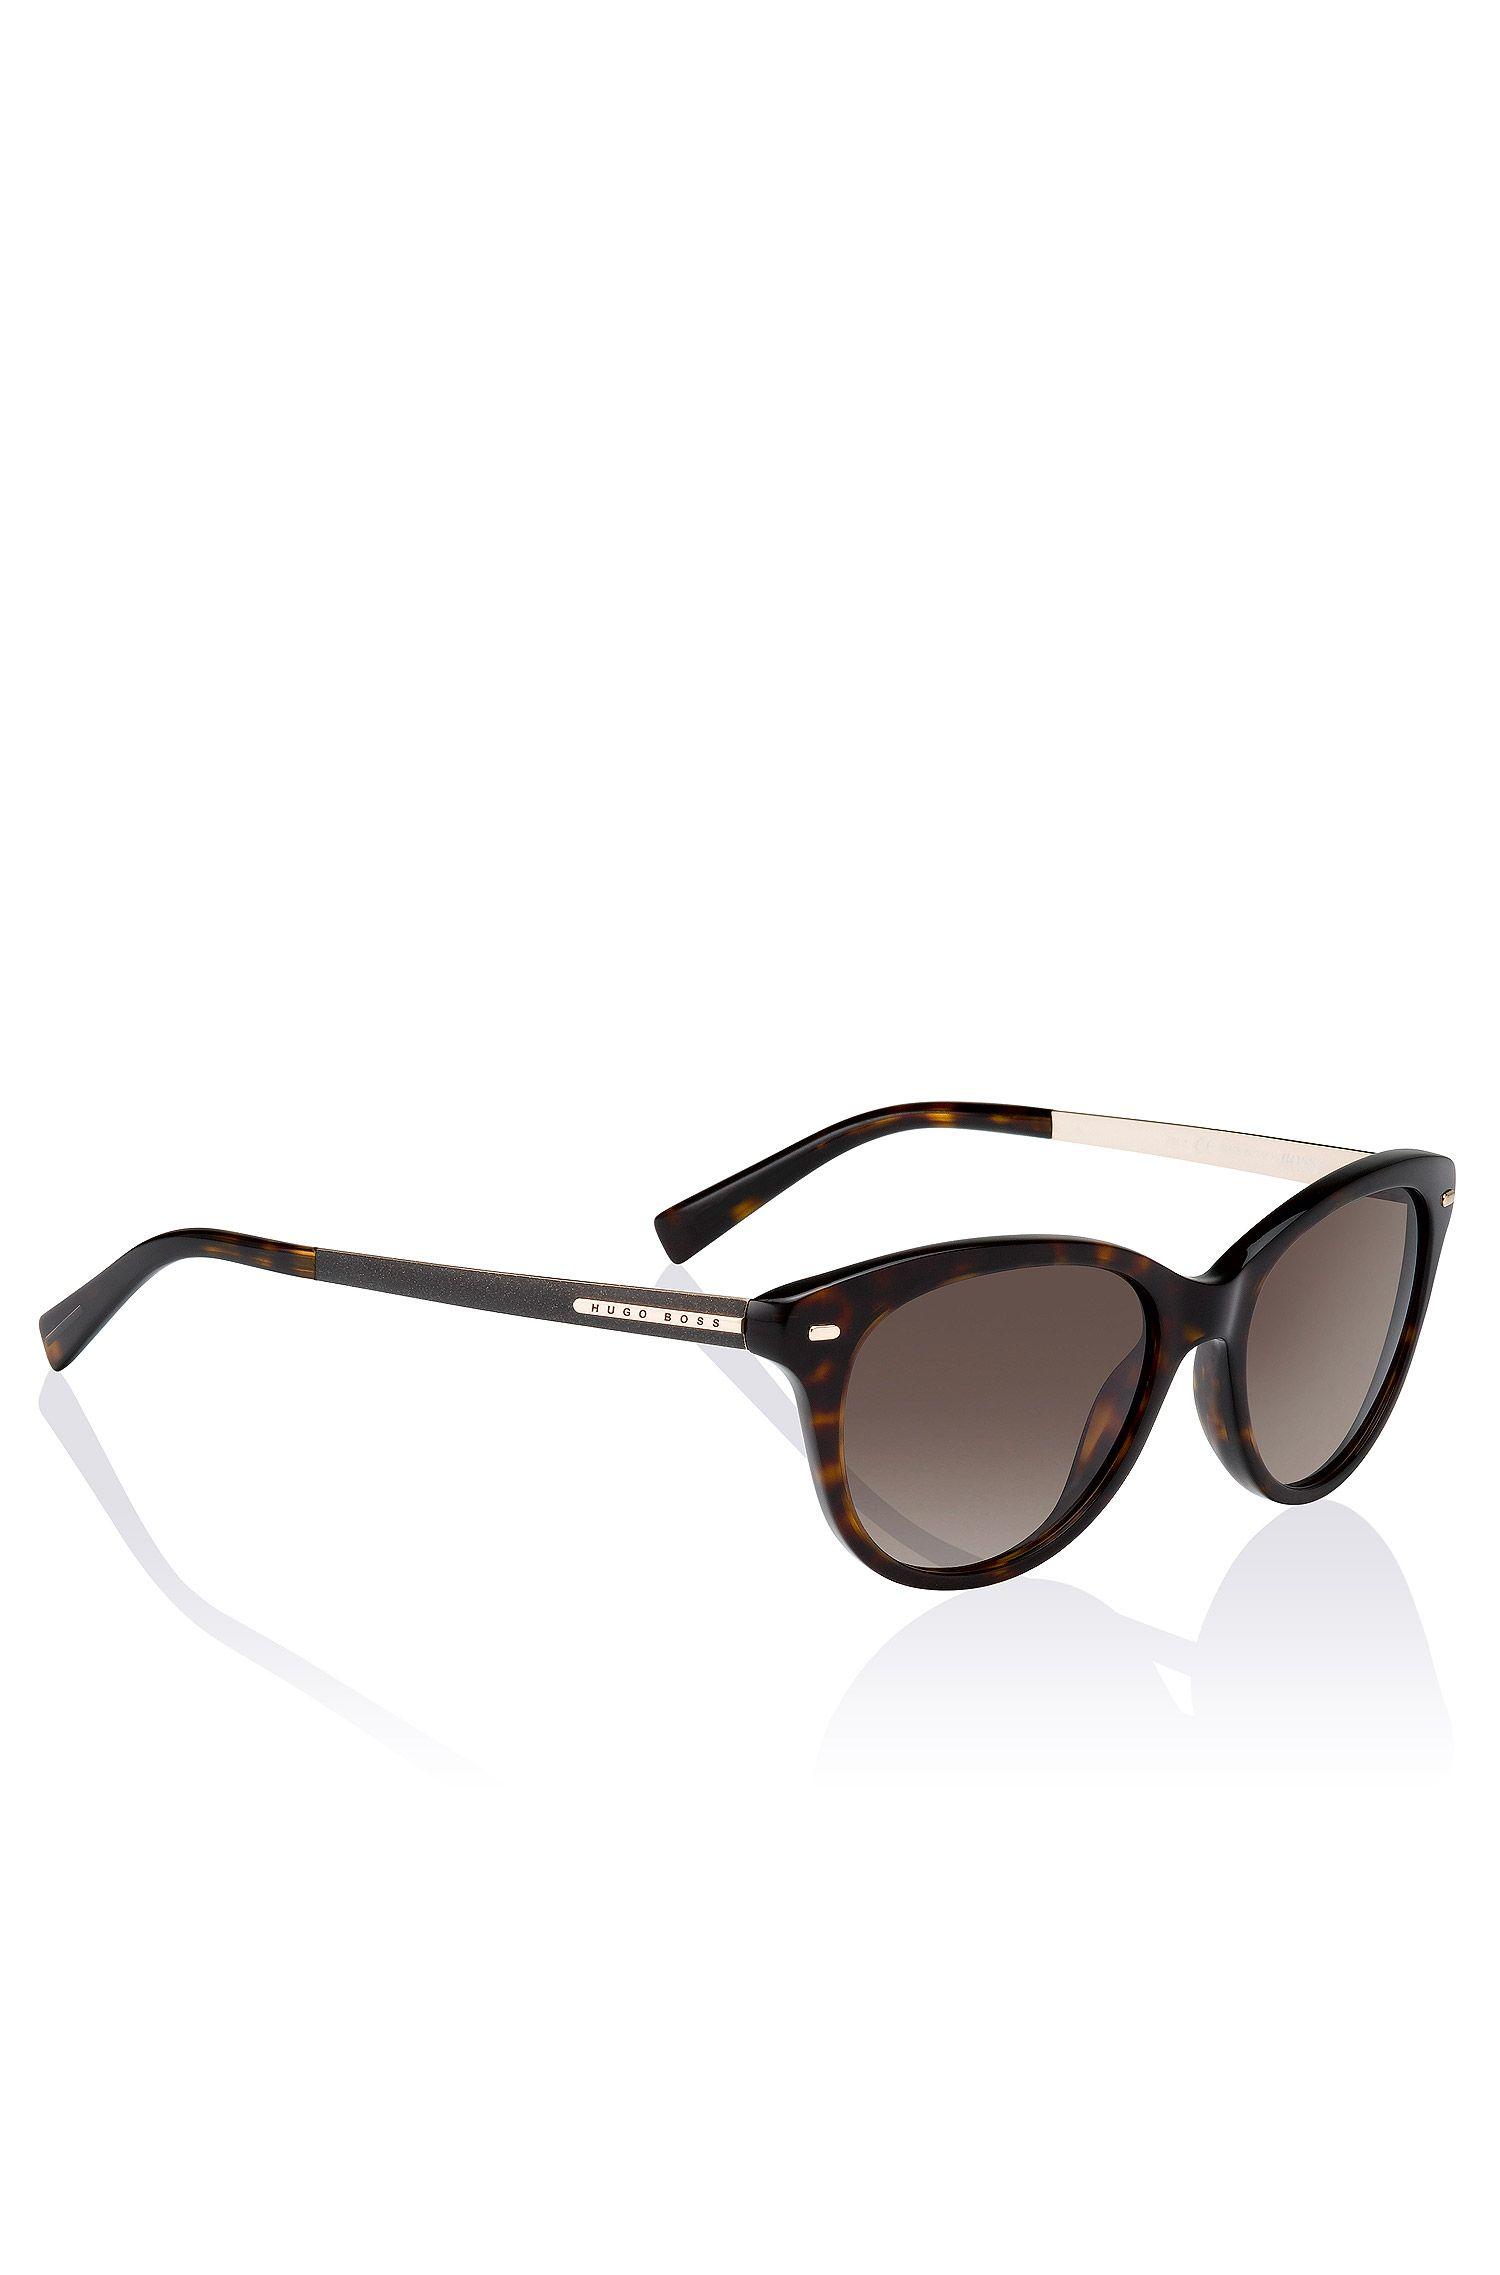 Sonnenbrille ´BOSS 0576/S`